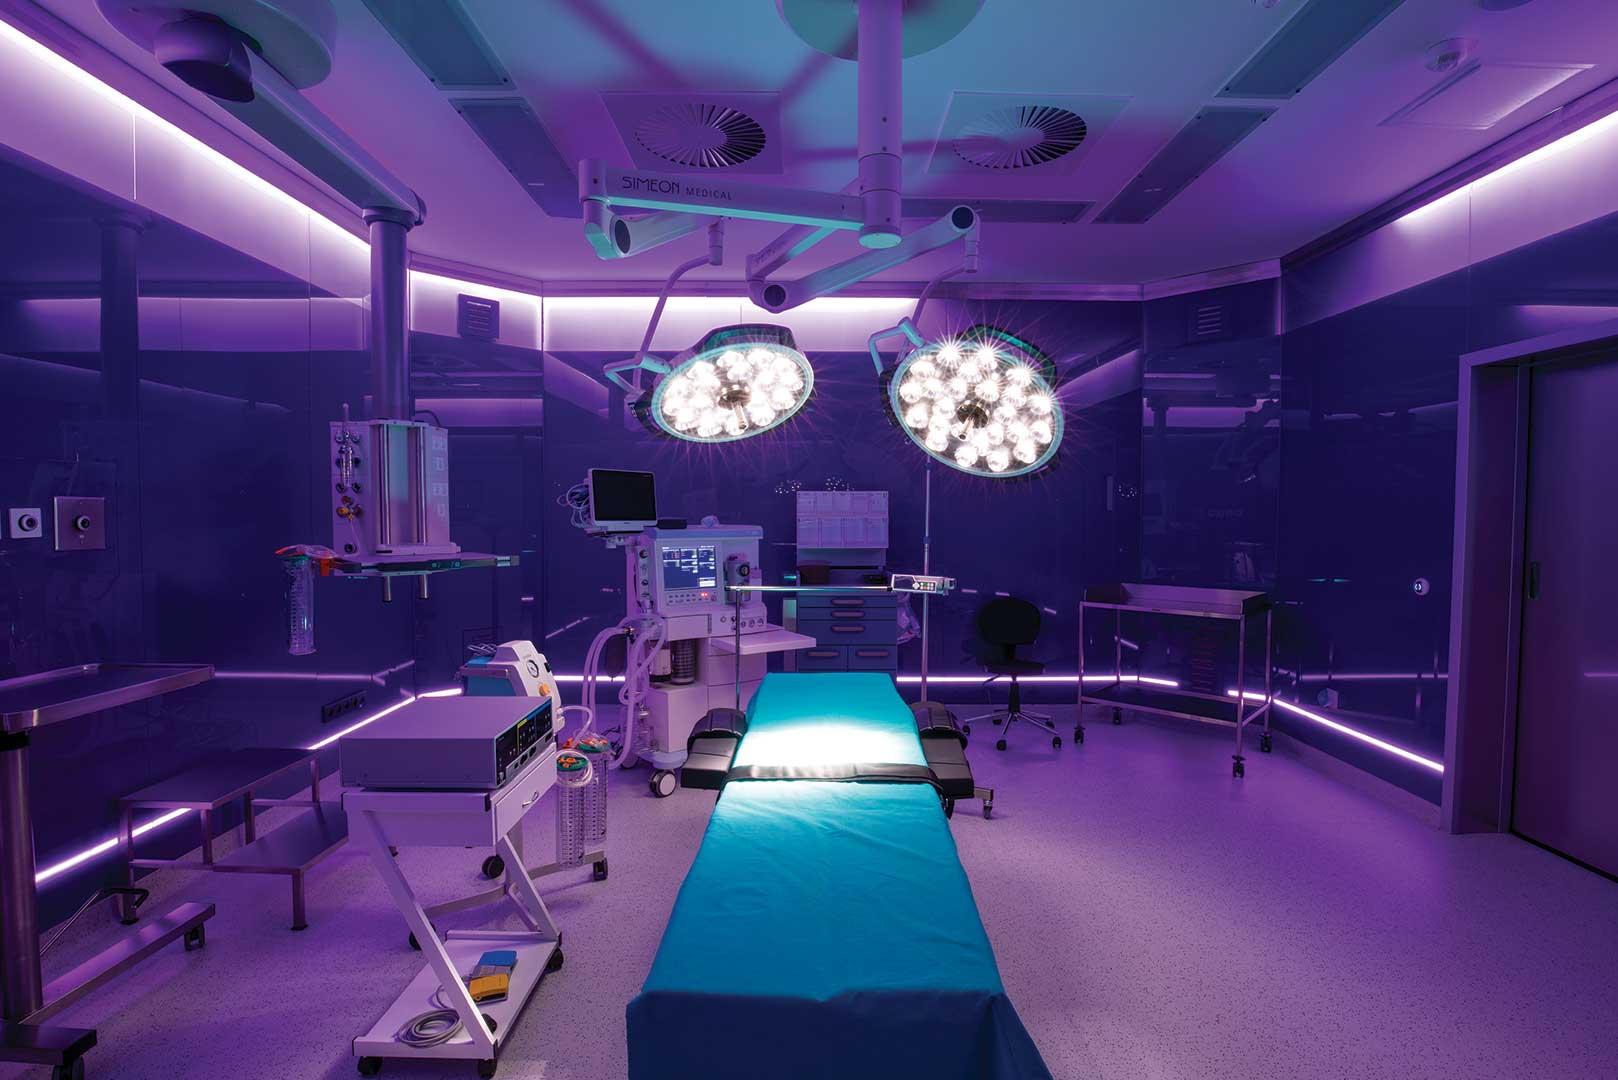 https://www.medicanahealthpoint.com/wp-content/uploads/2021/03/medicana-atasehir-hastanesi-ic.jpg